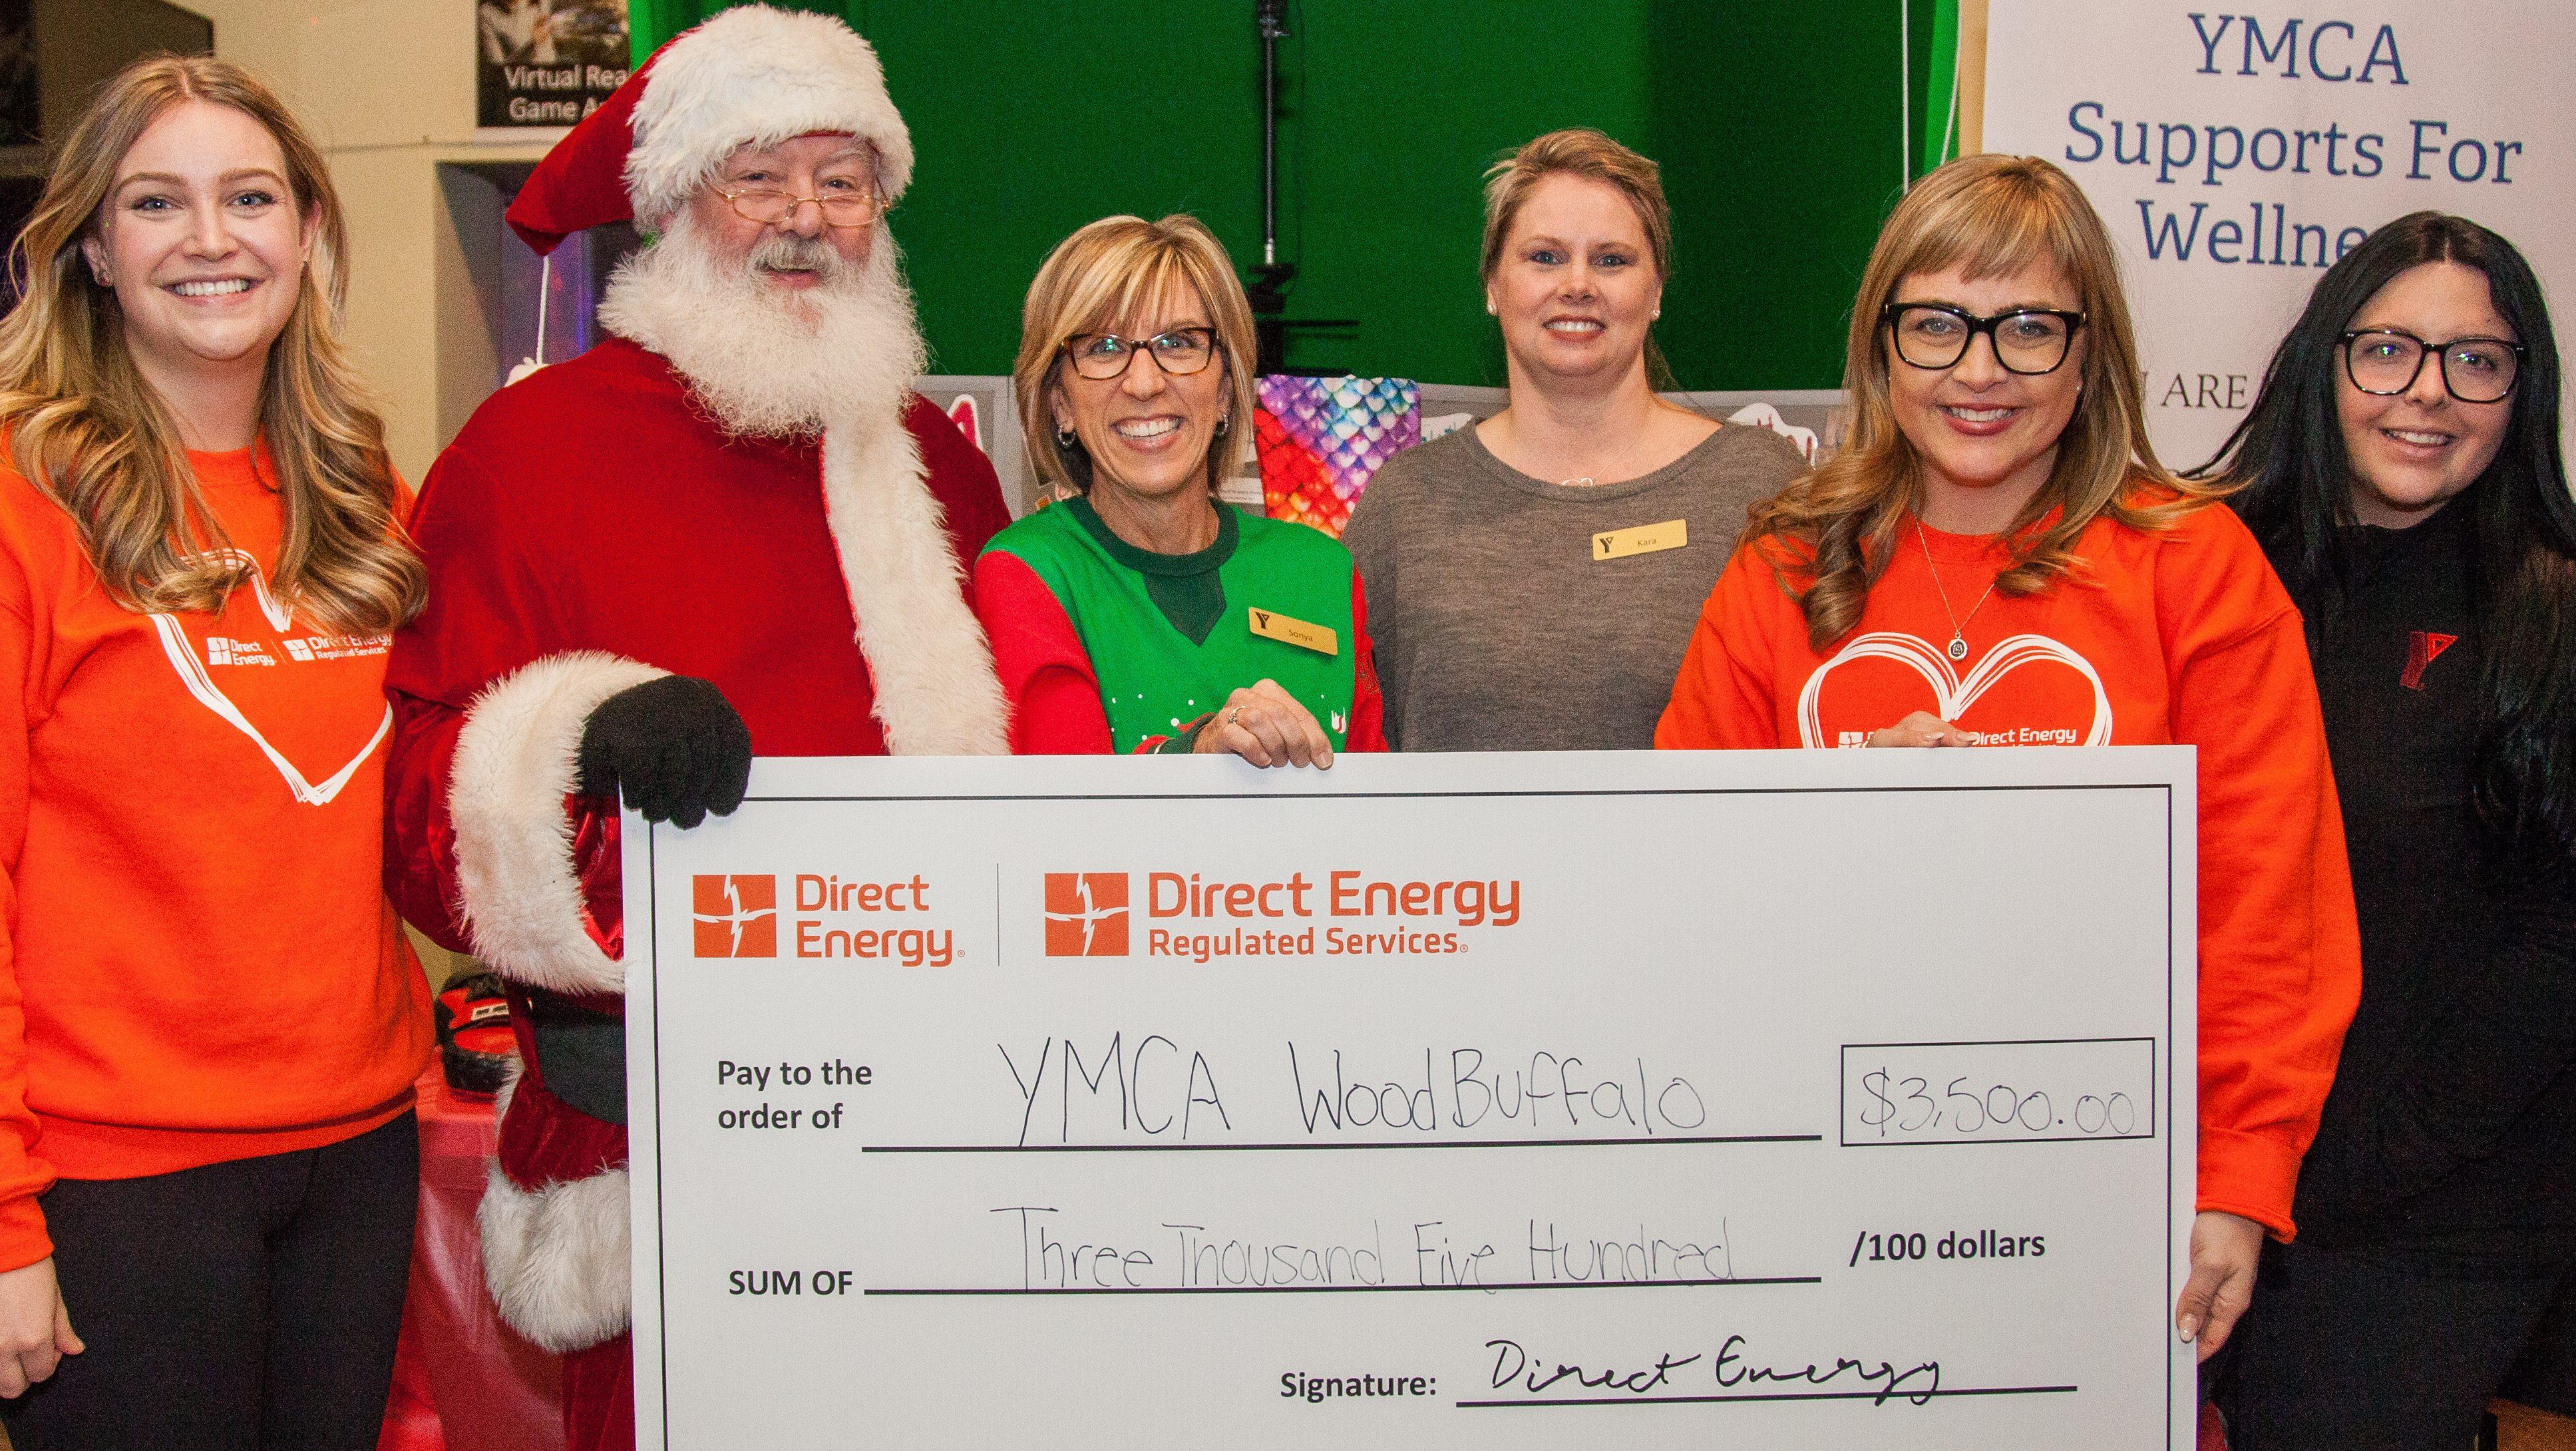 Direct Energy donates $3,500 to the YMCA of Wood Buffalo